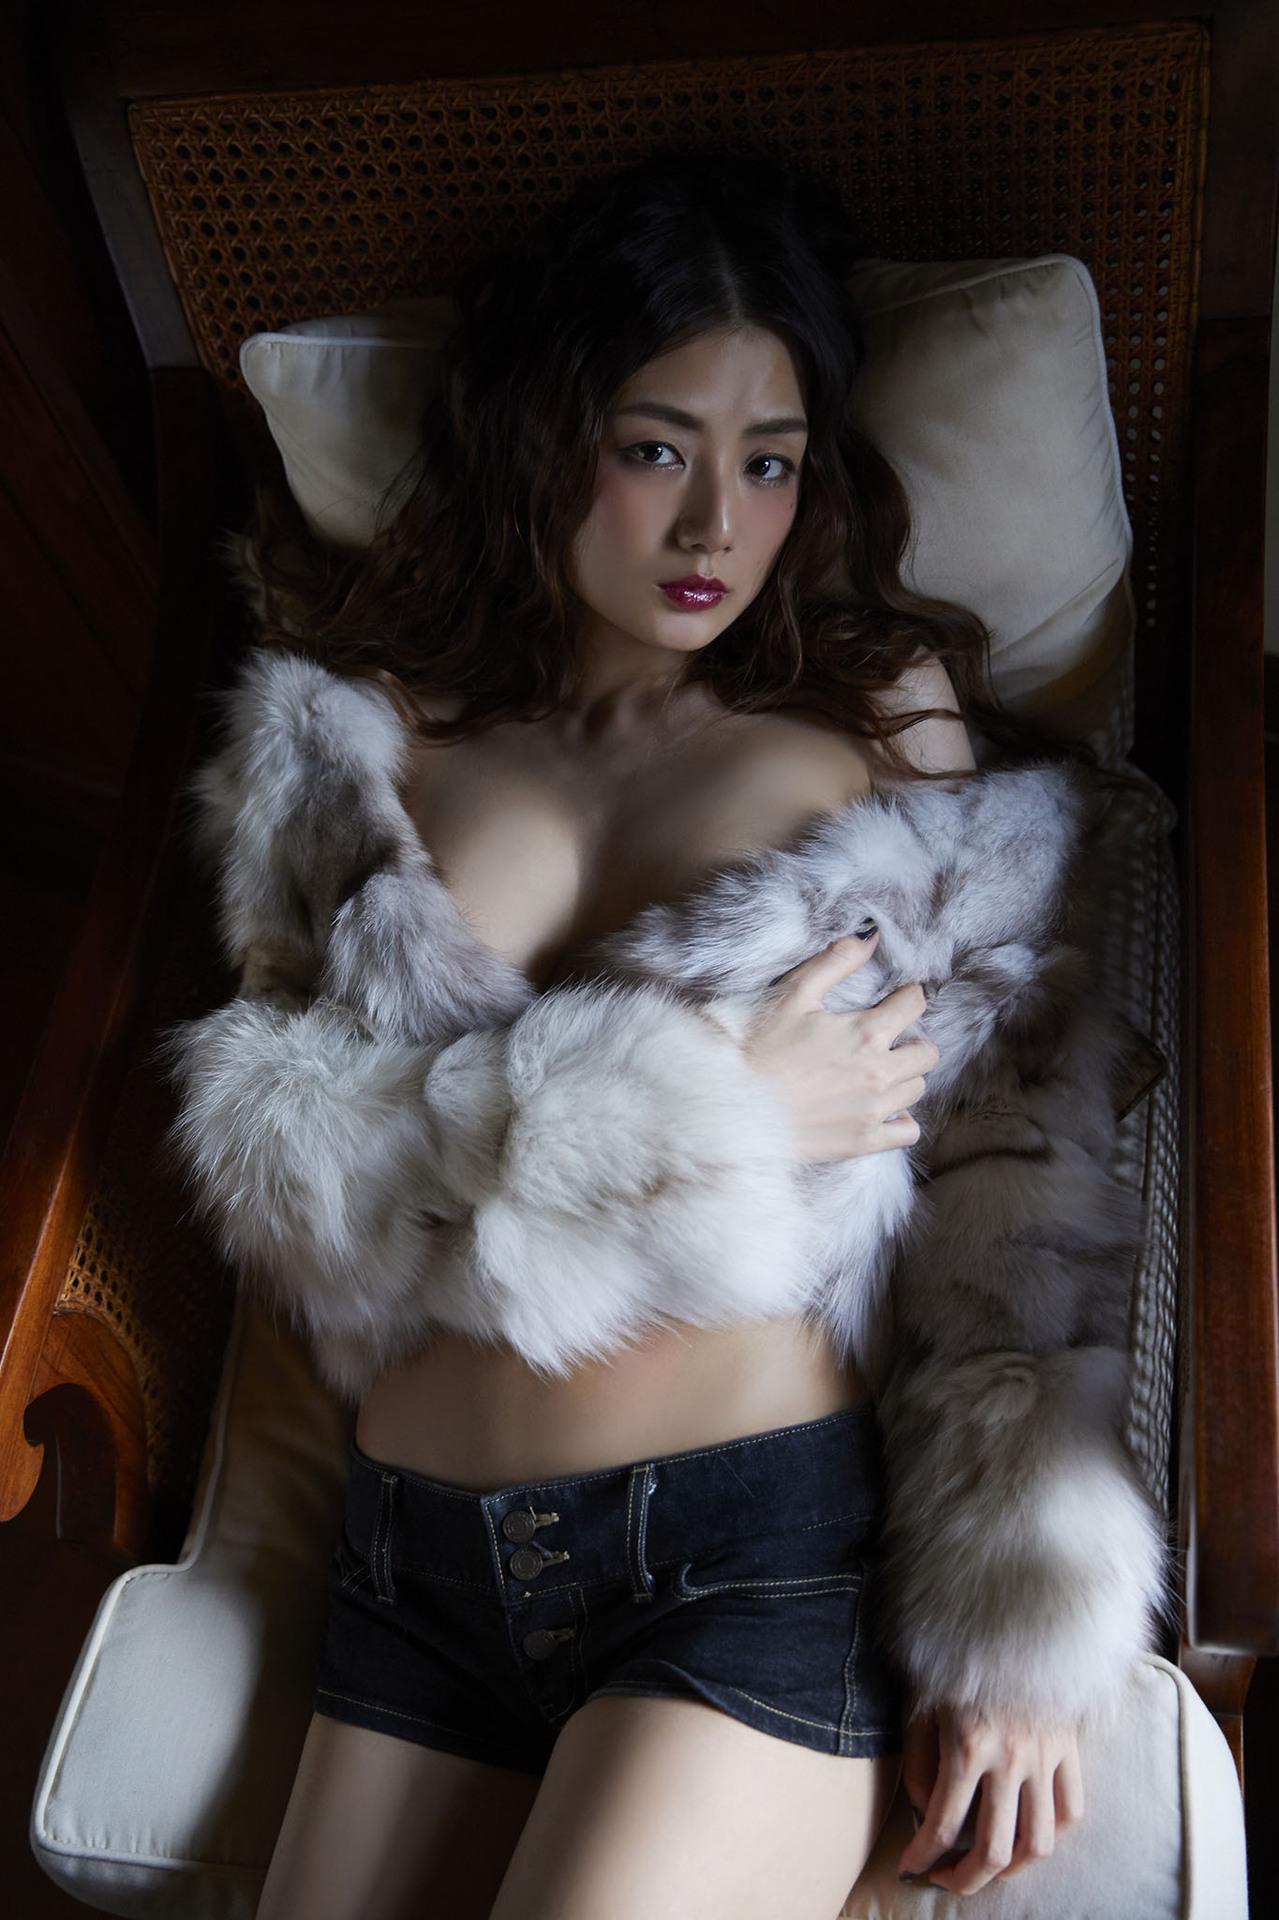 片山萌美 Poker Face 00030